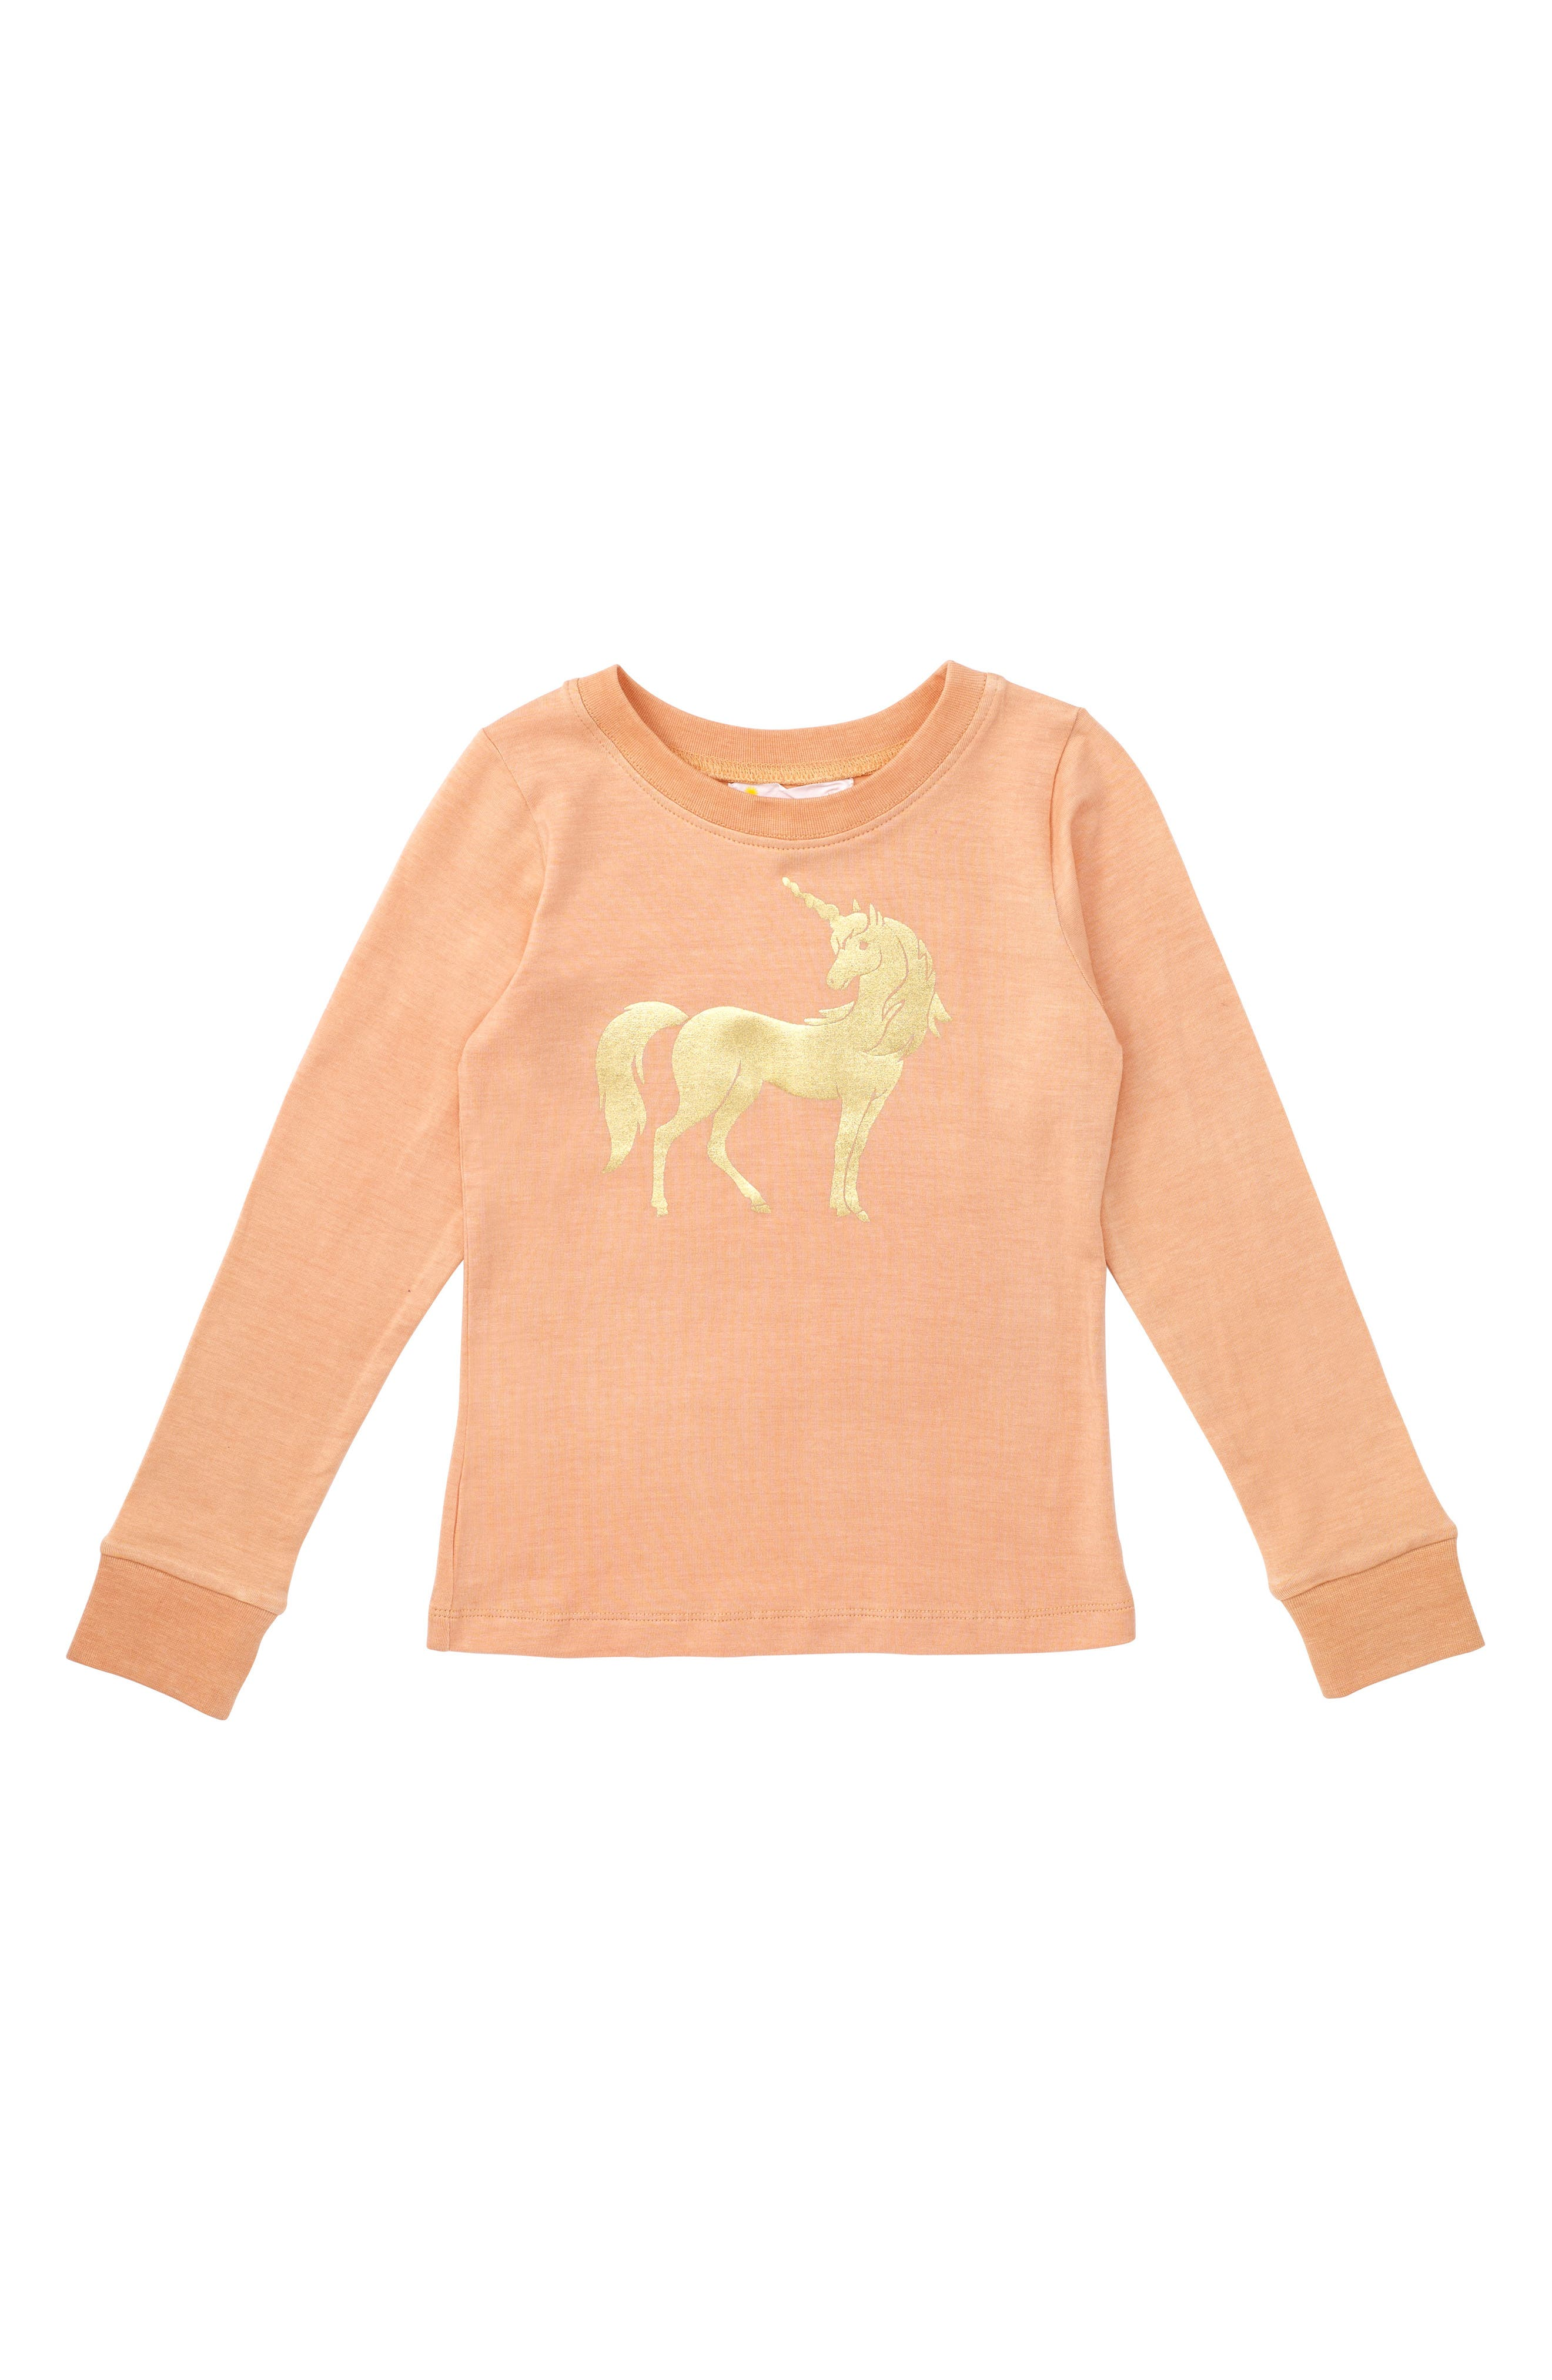 Unicorn Graphic Tee,                         Main,                         color, Peach